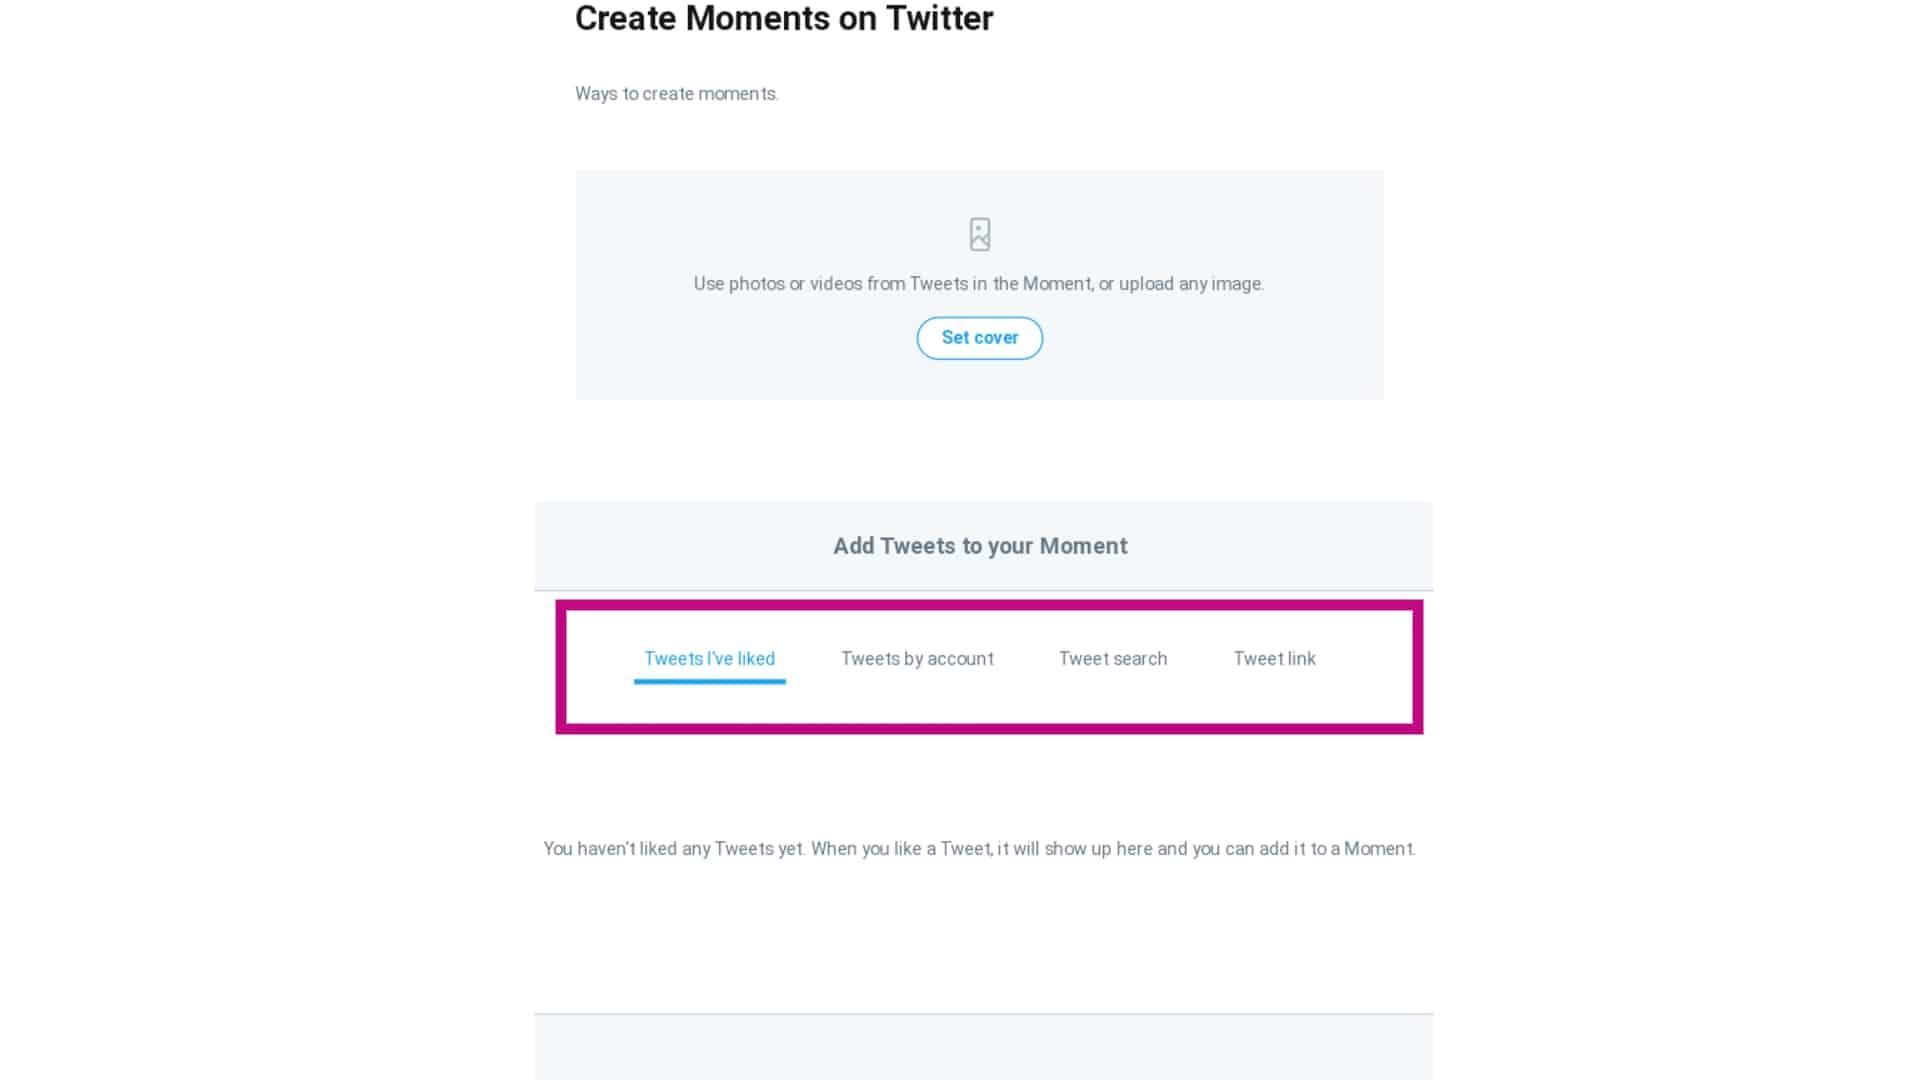 twitter moments add tweets